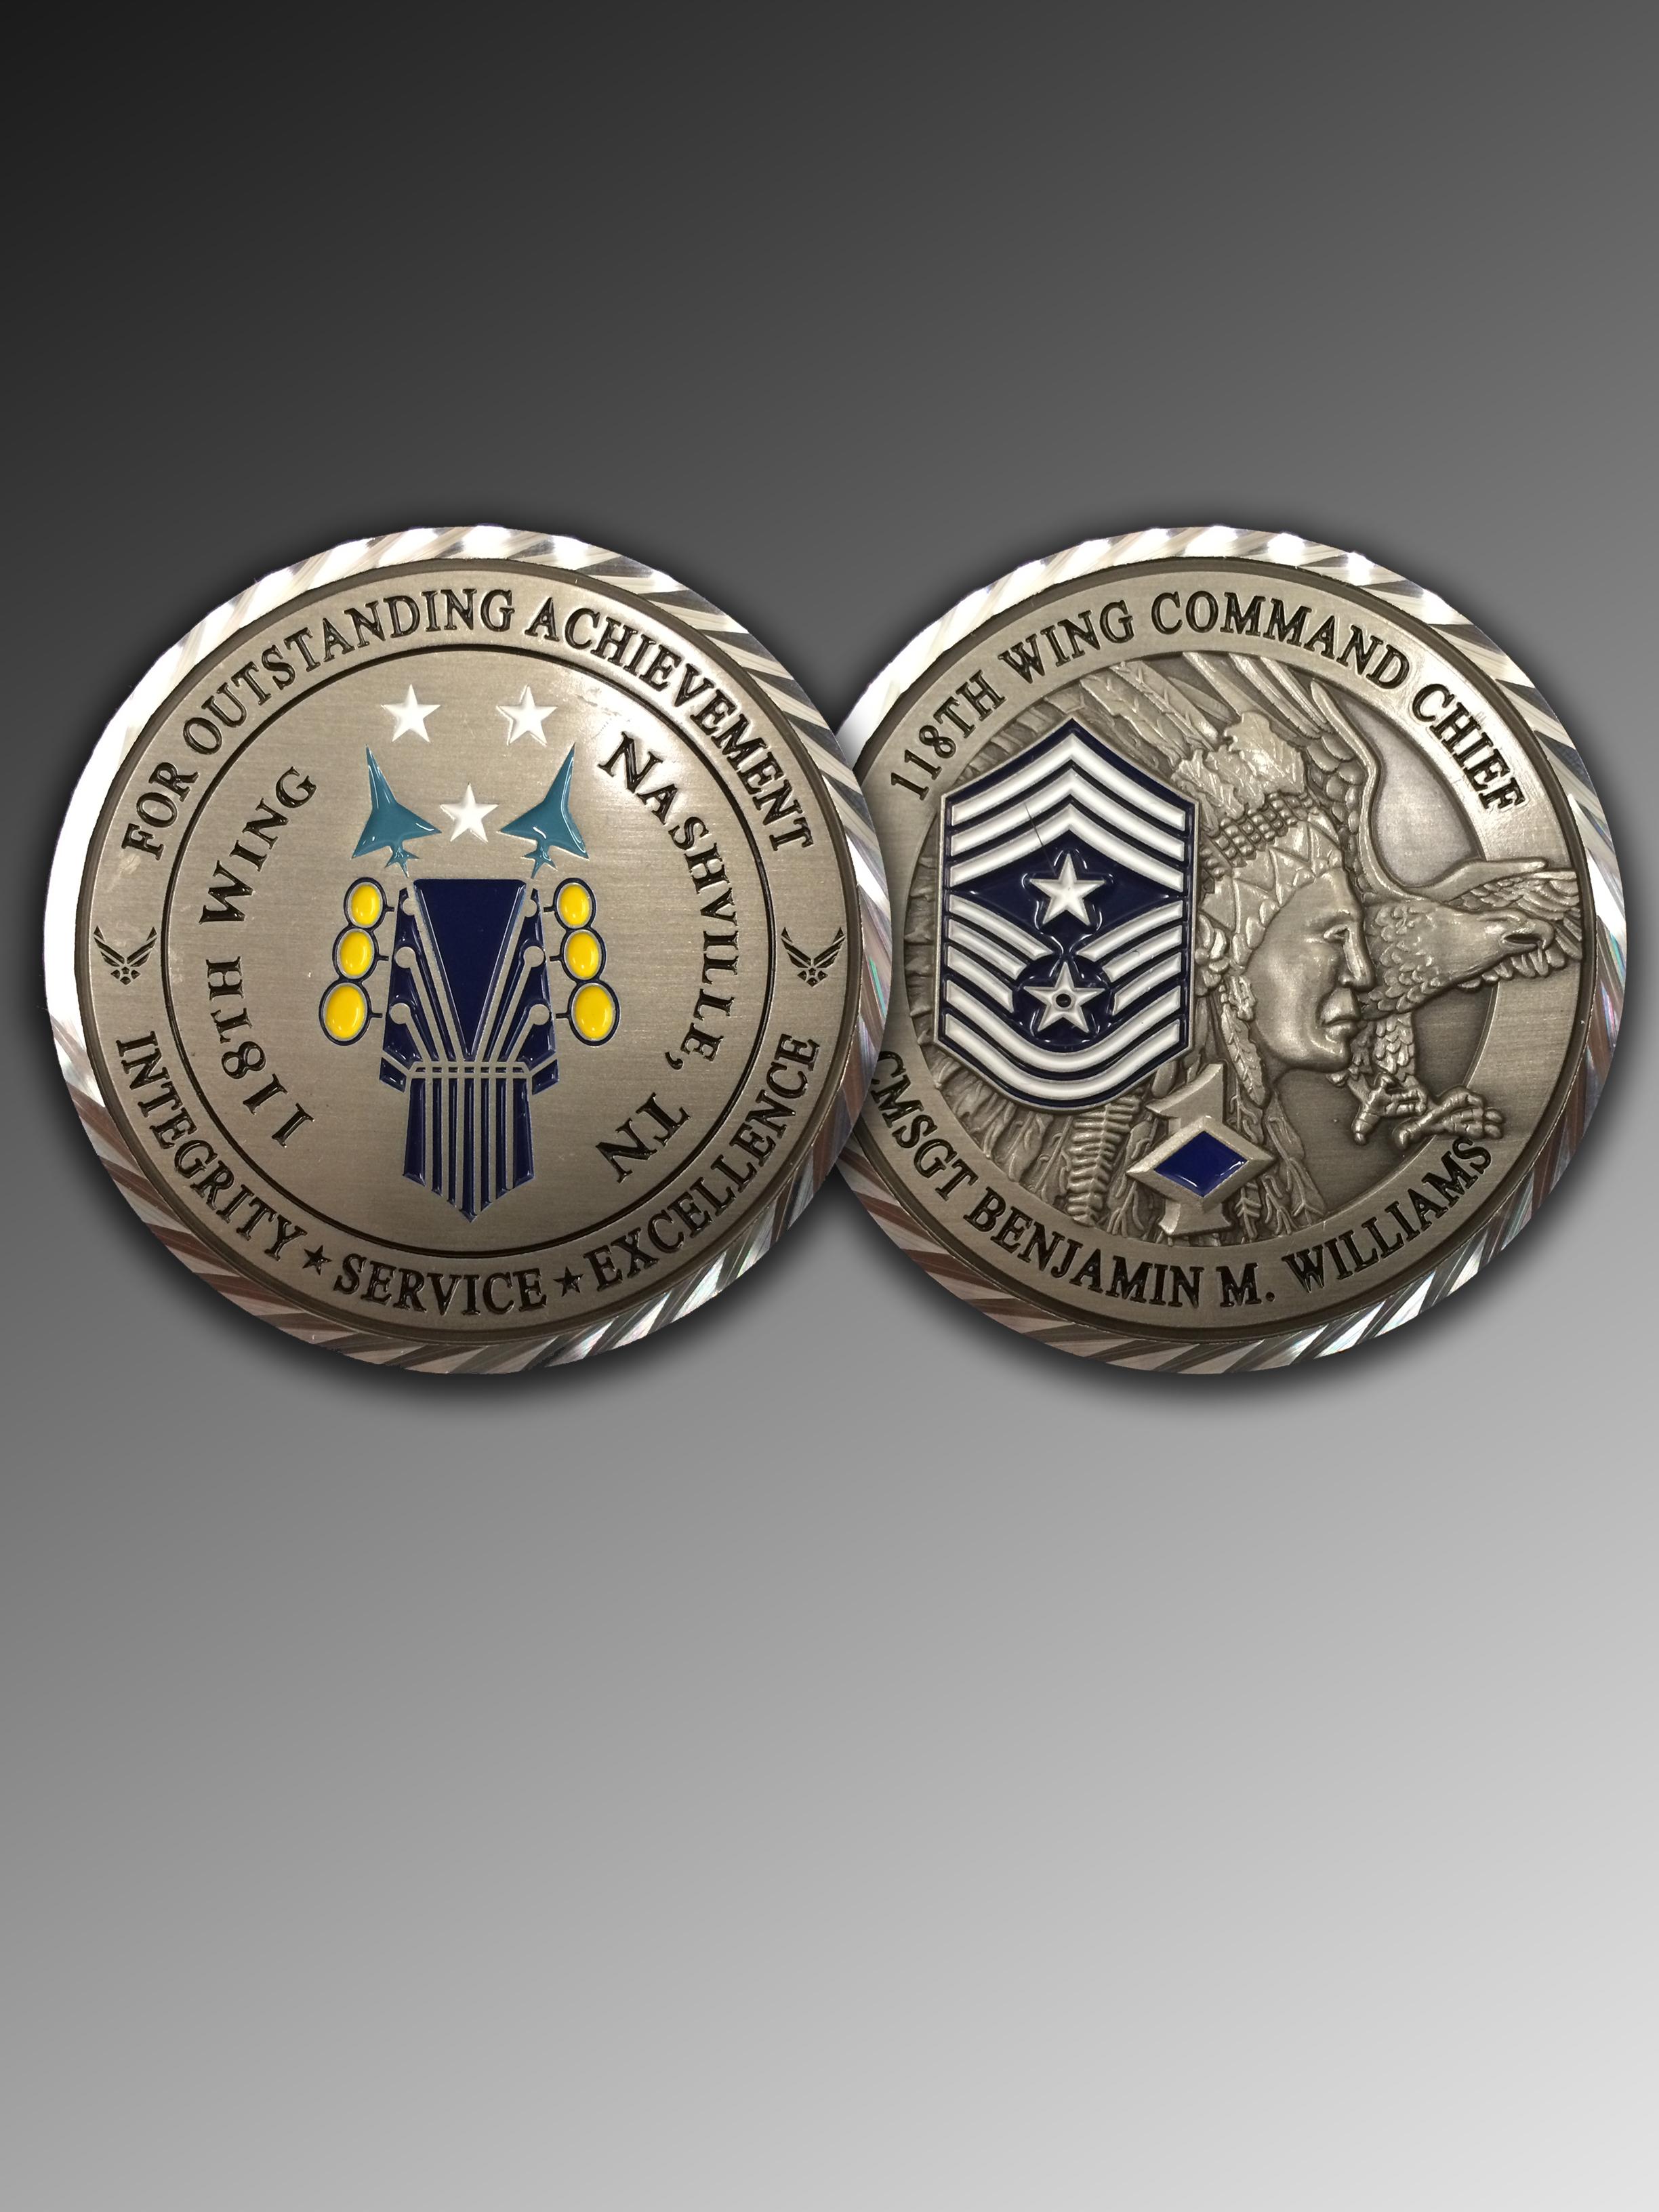 cmsgt-williams-coin